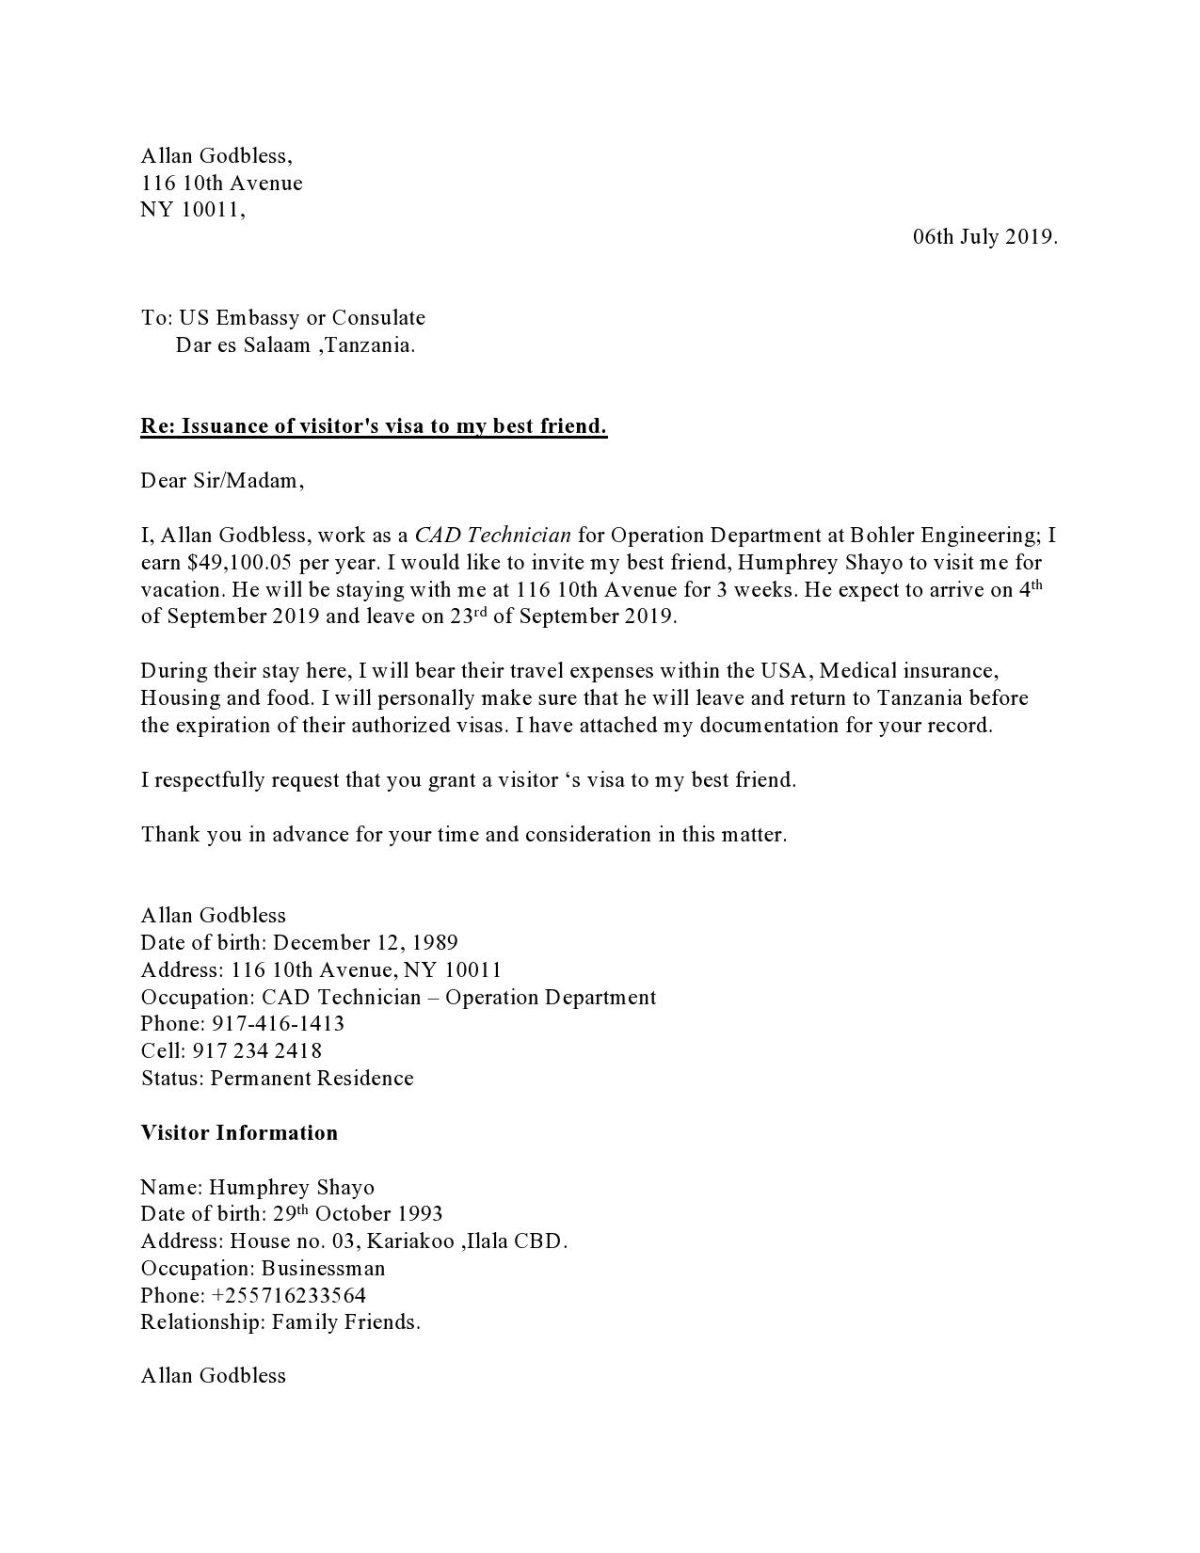 Invitation-Letter-for-Visa-Application-Sample-page0001 Visa Application Letter Format on for advance, business owners, employer for,